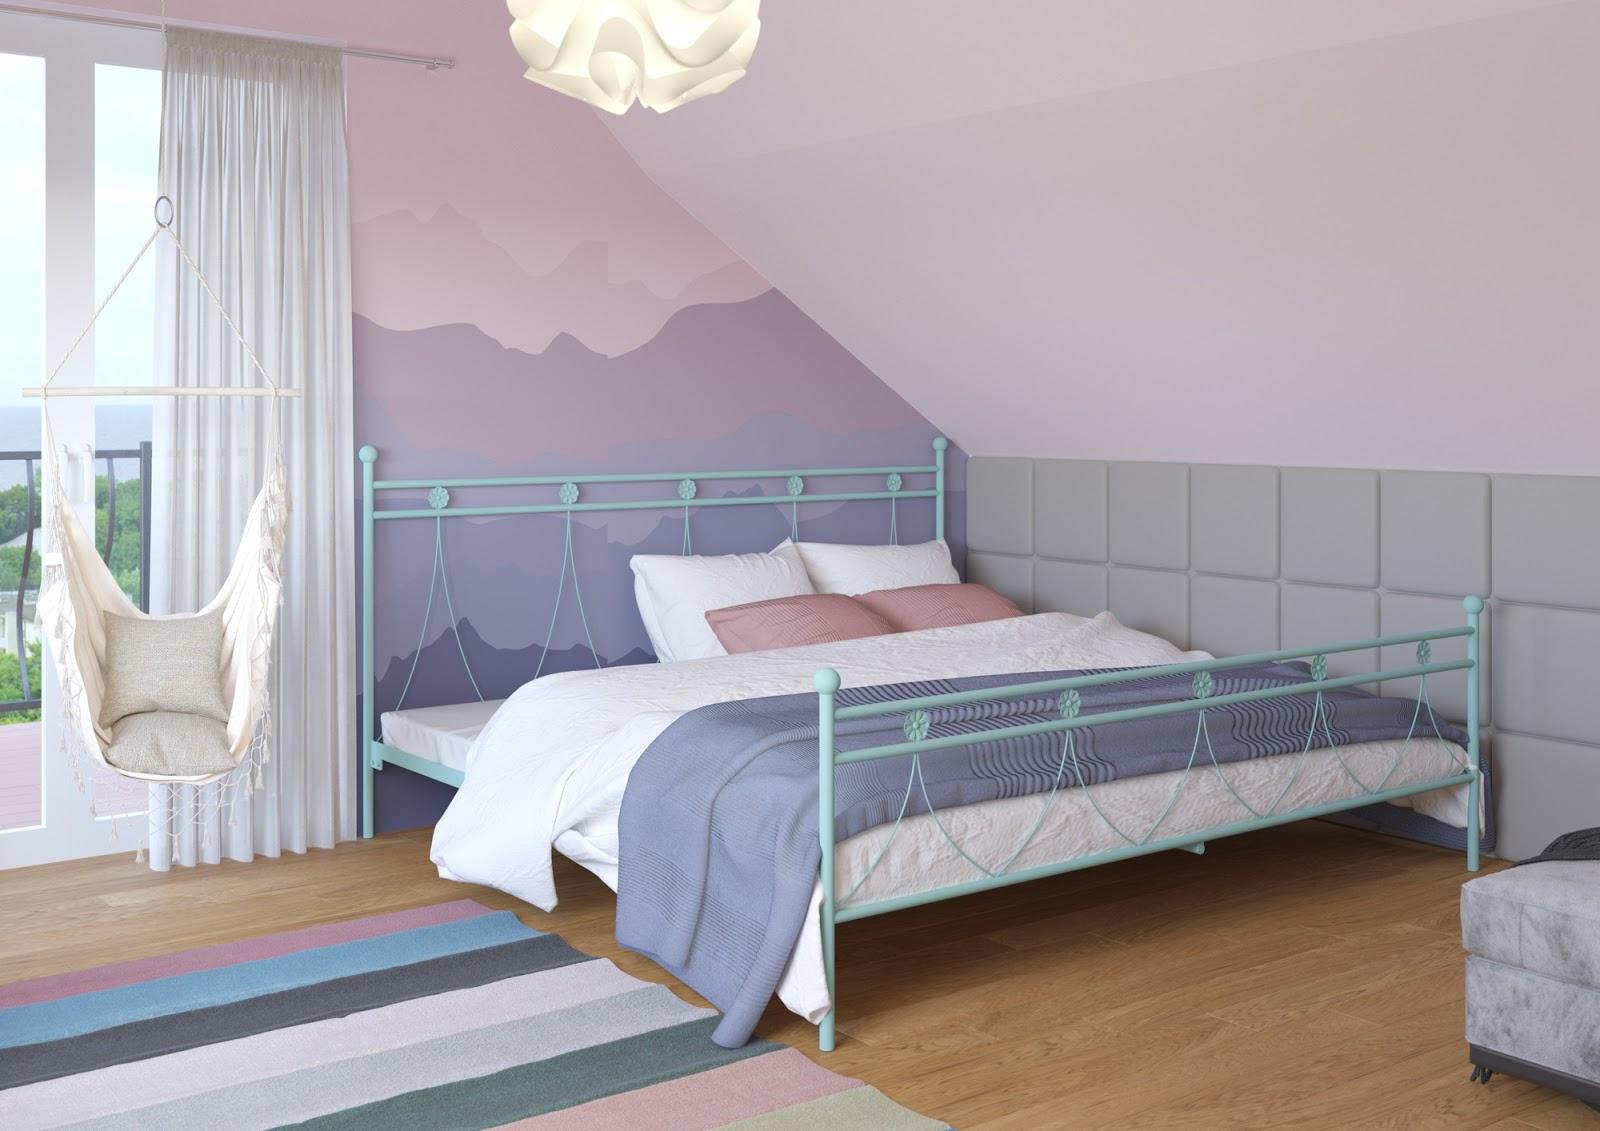 Łóżko metalowe wzór 37 (160-180 cm)